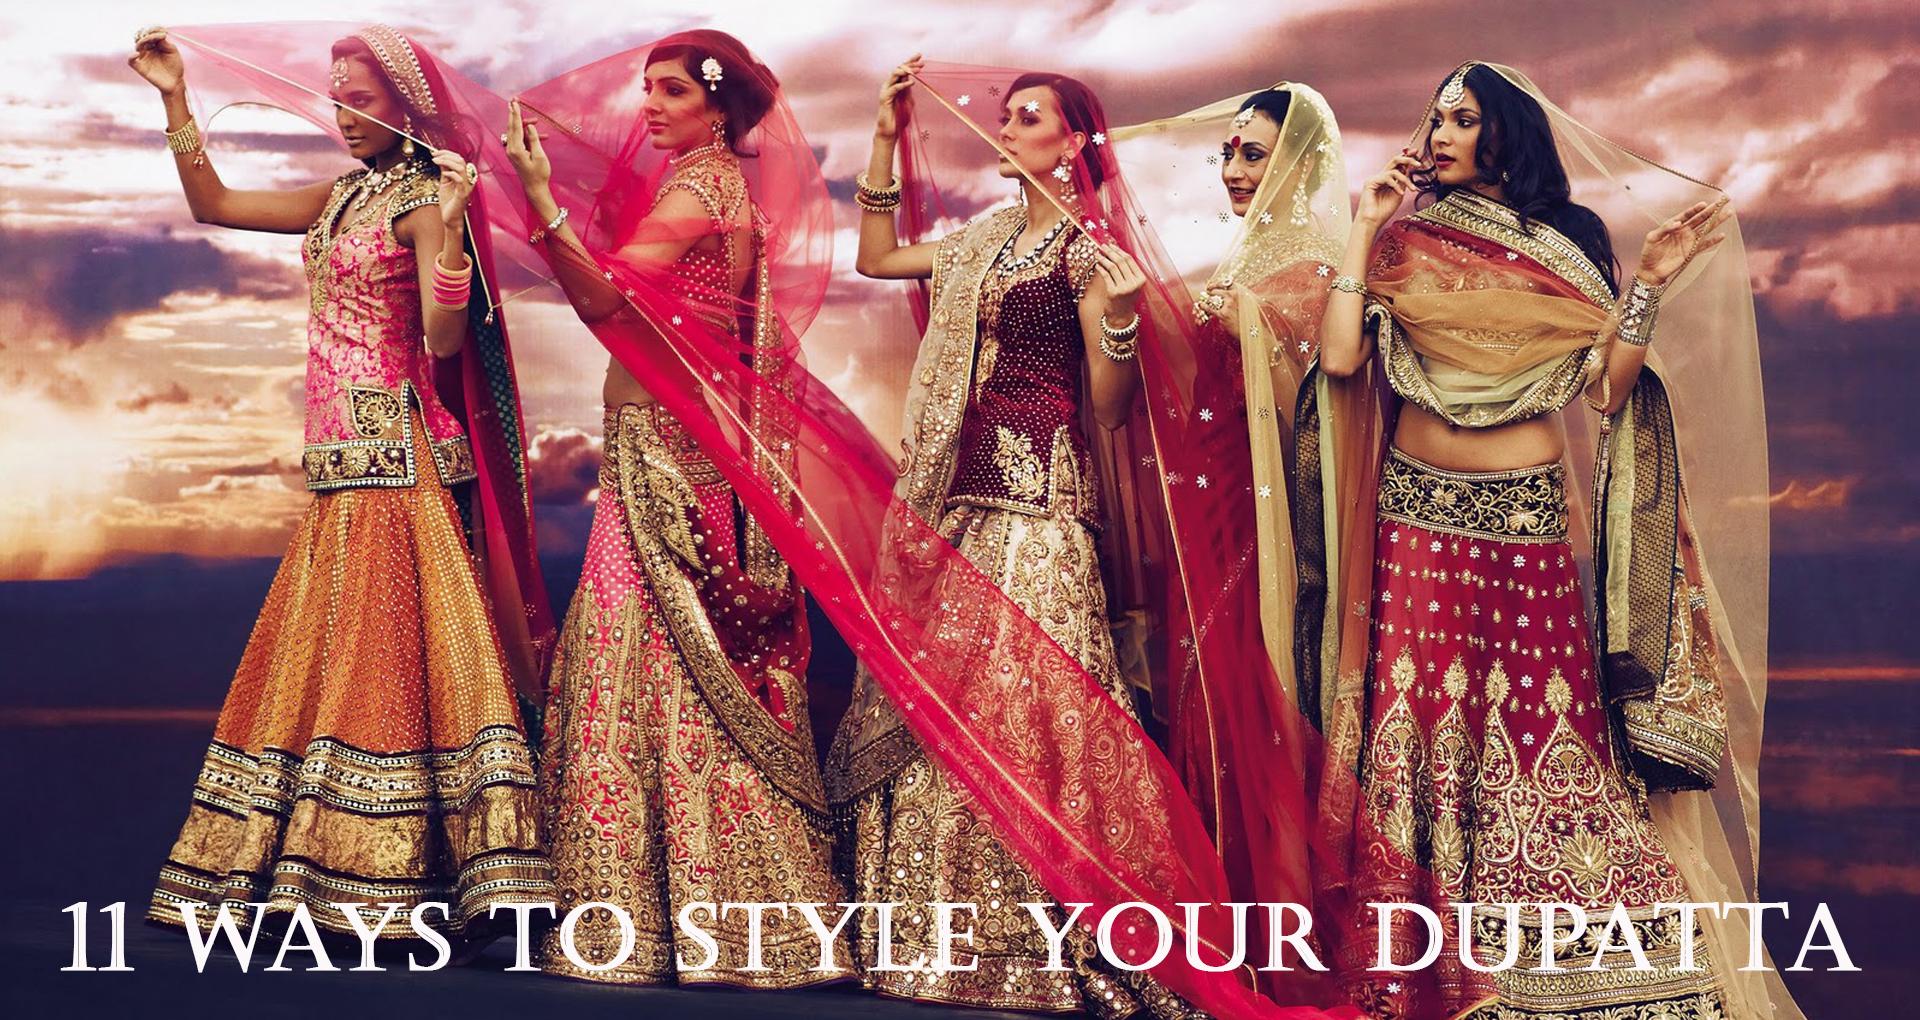 New style dress in pakistan 2018 facebook iq